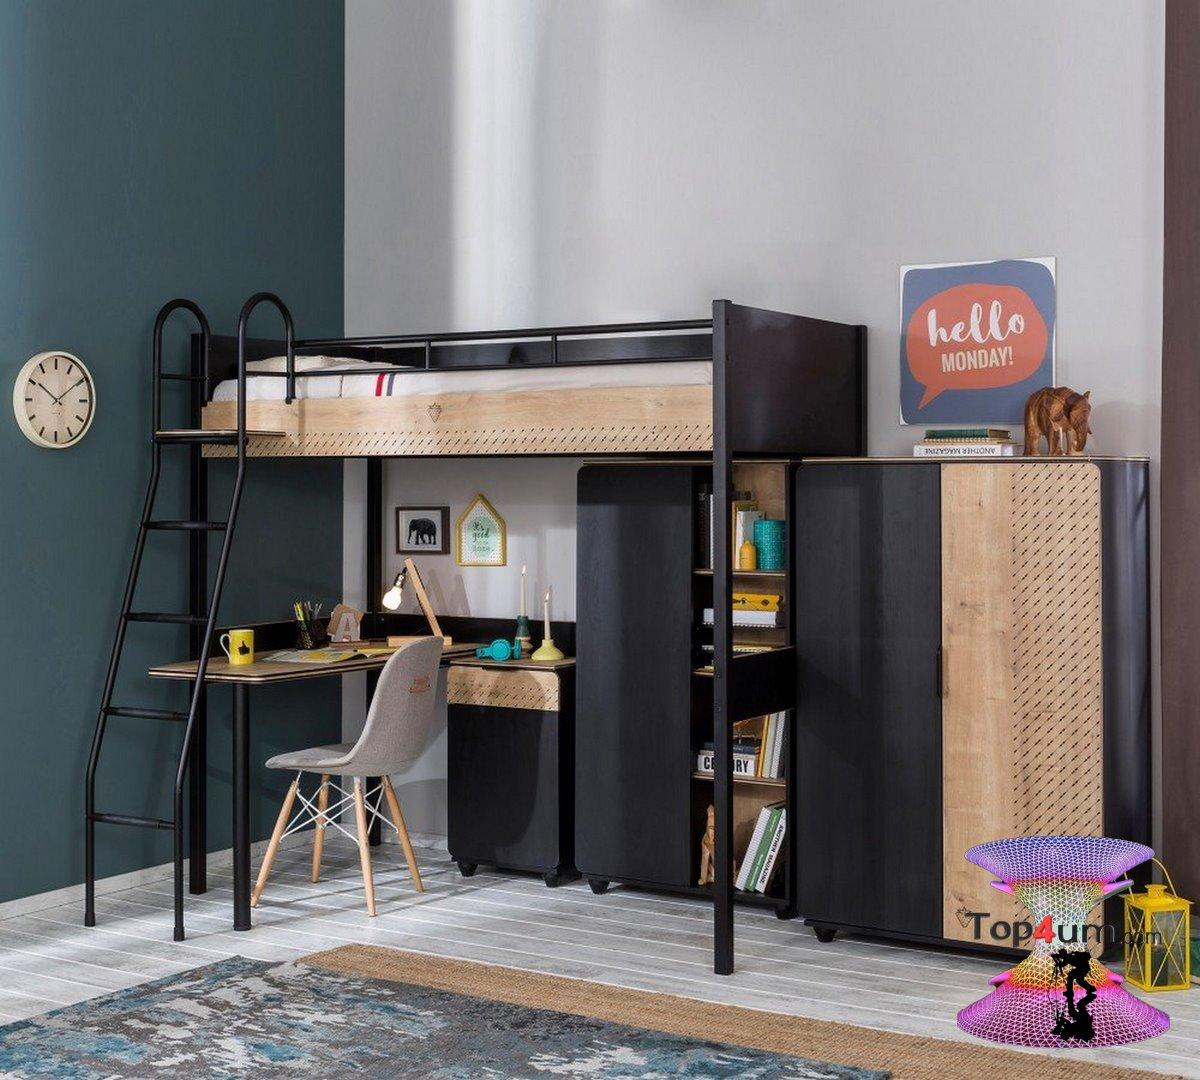 f:id:kitchendesignsegypt:20191020022215j:plain